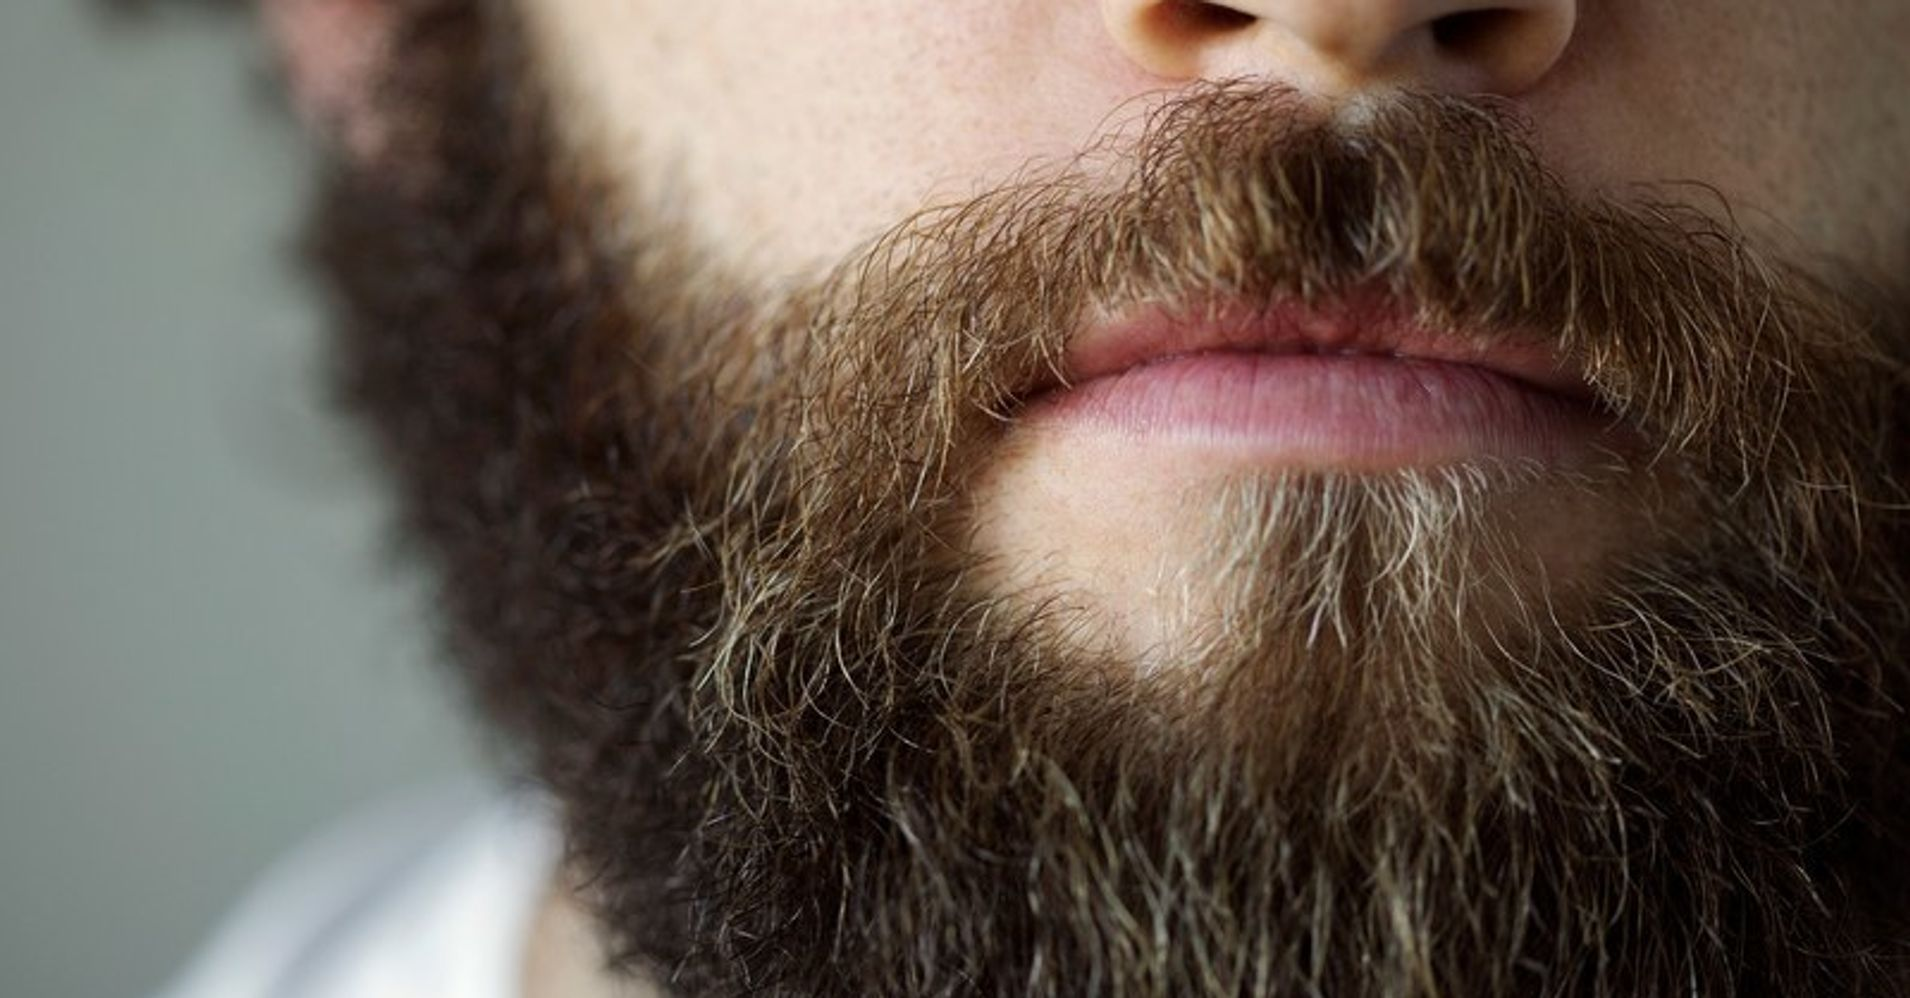 victors beard essay